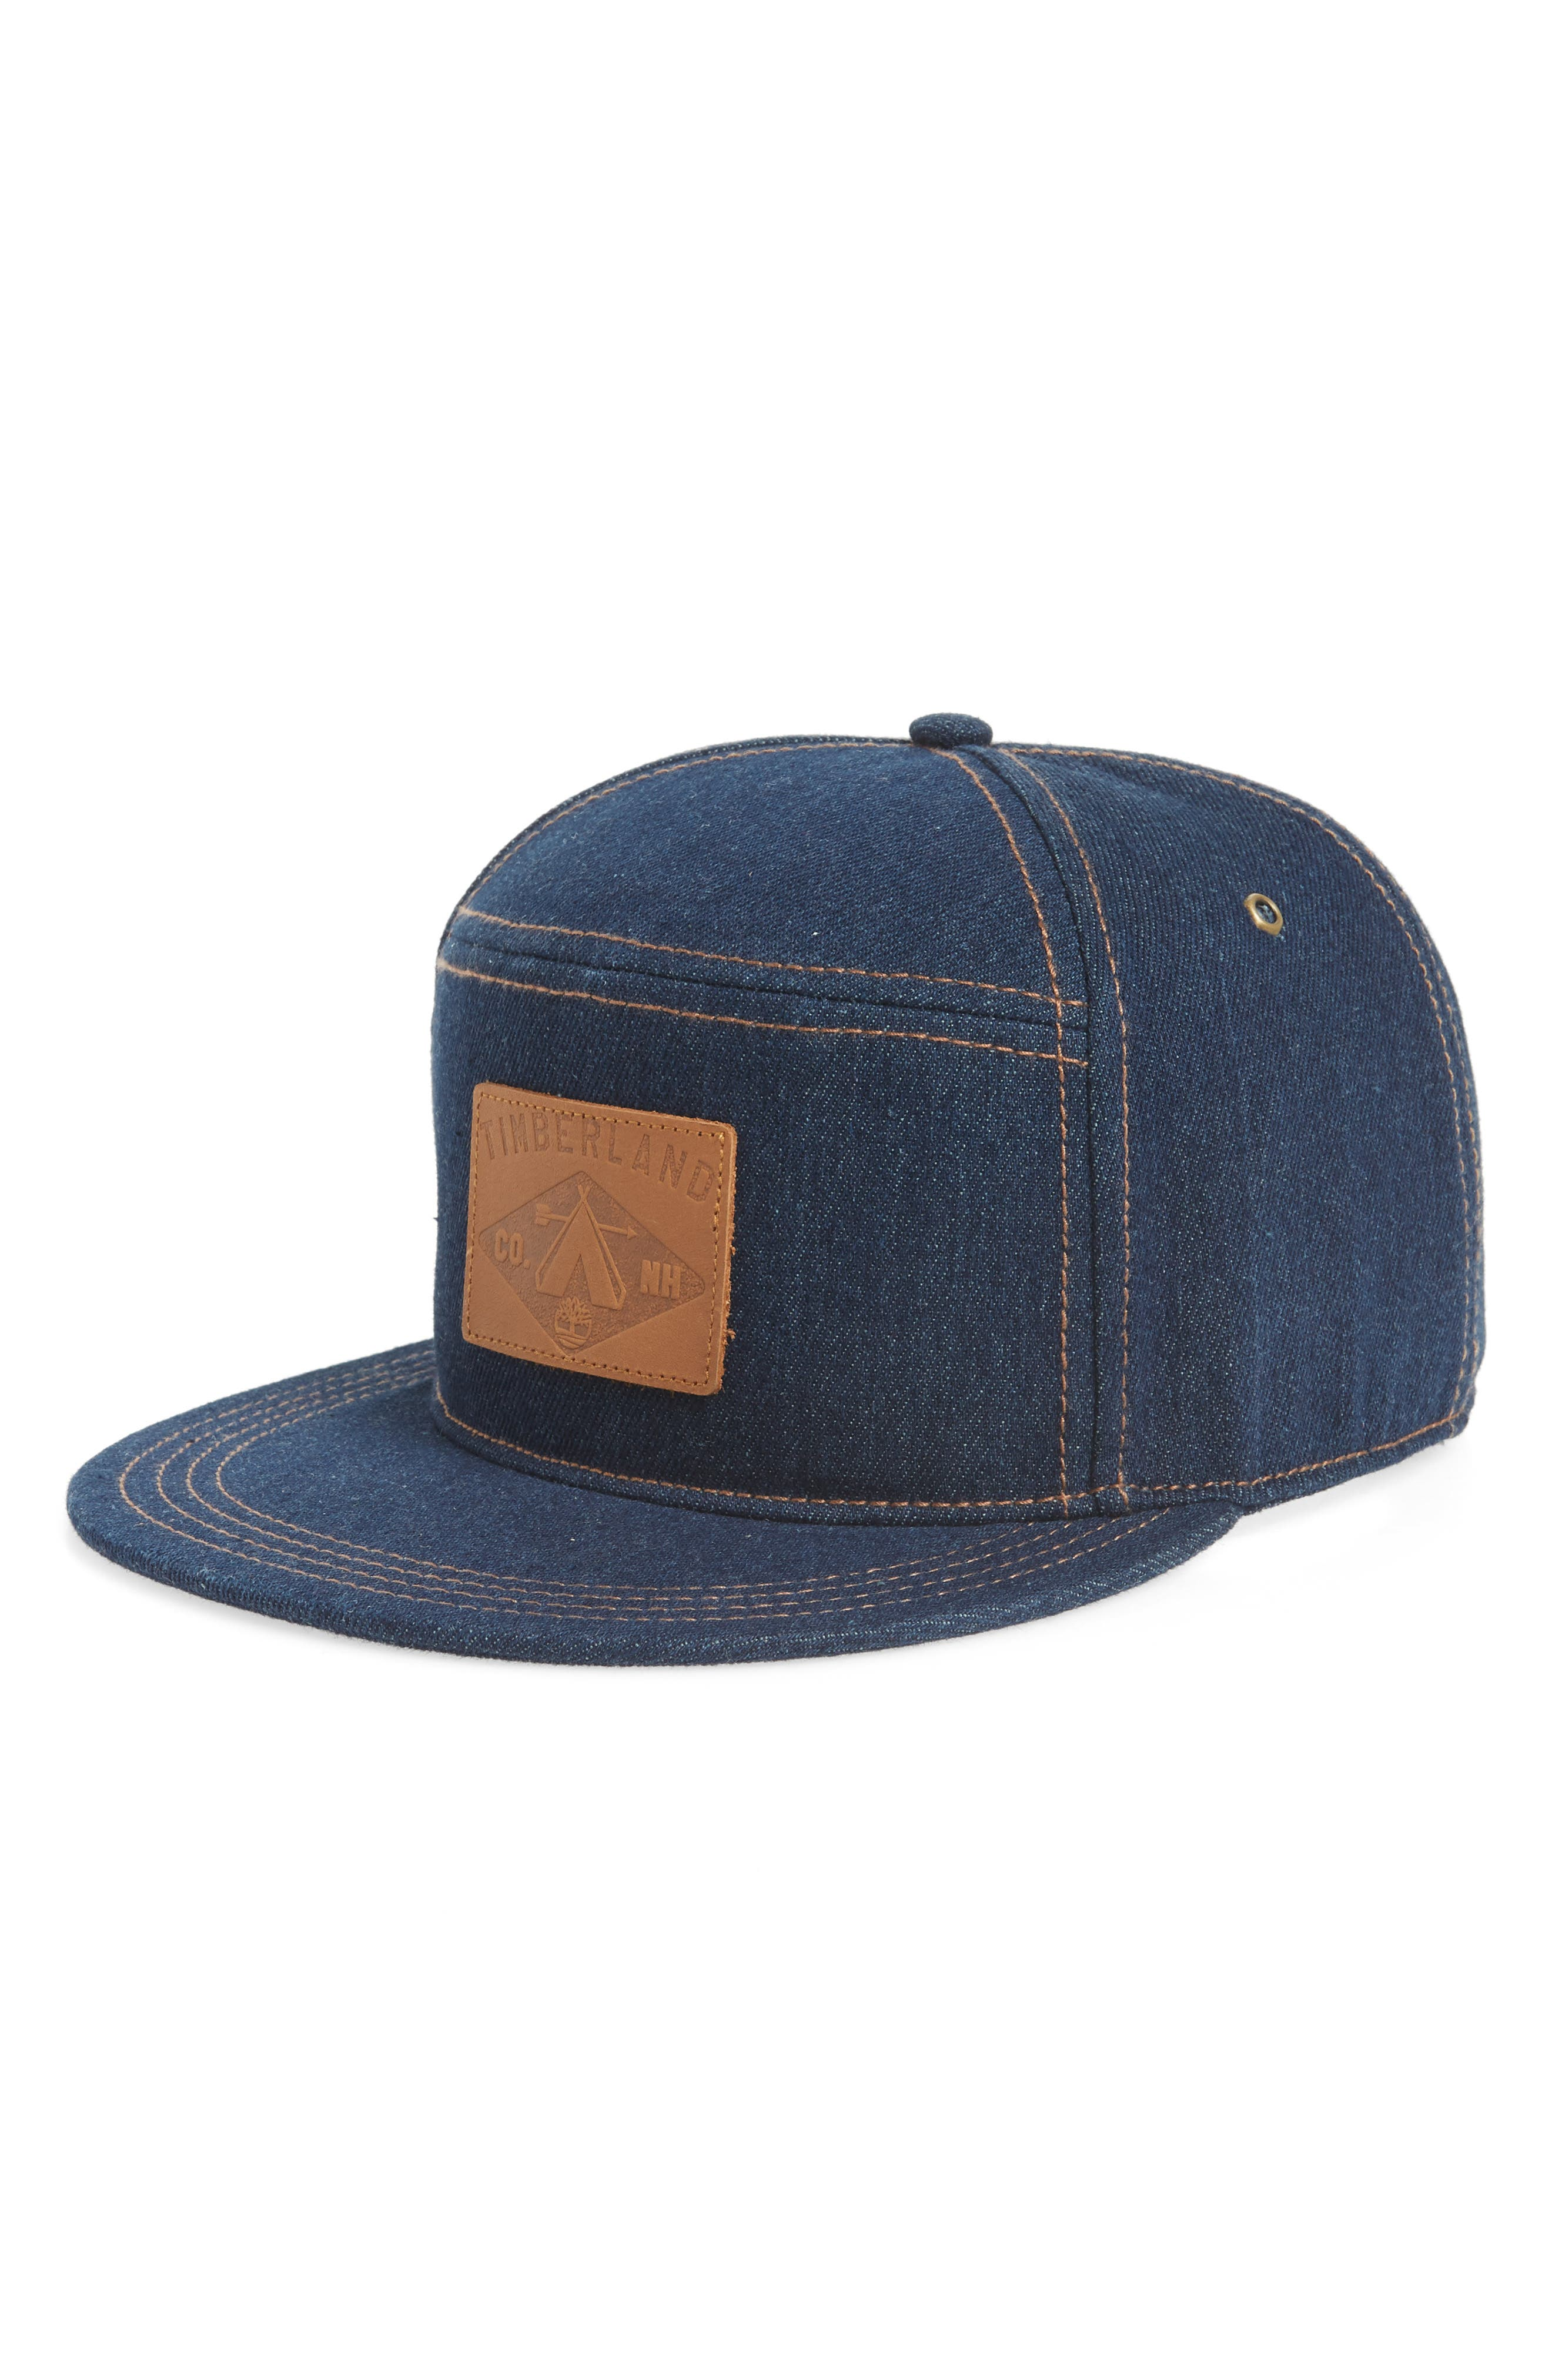 Plum Island Baseball Cap,                         Main,                         color, DARK DENIM